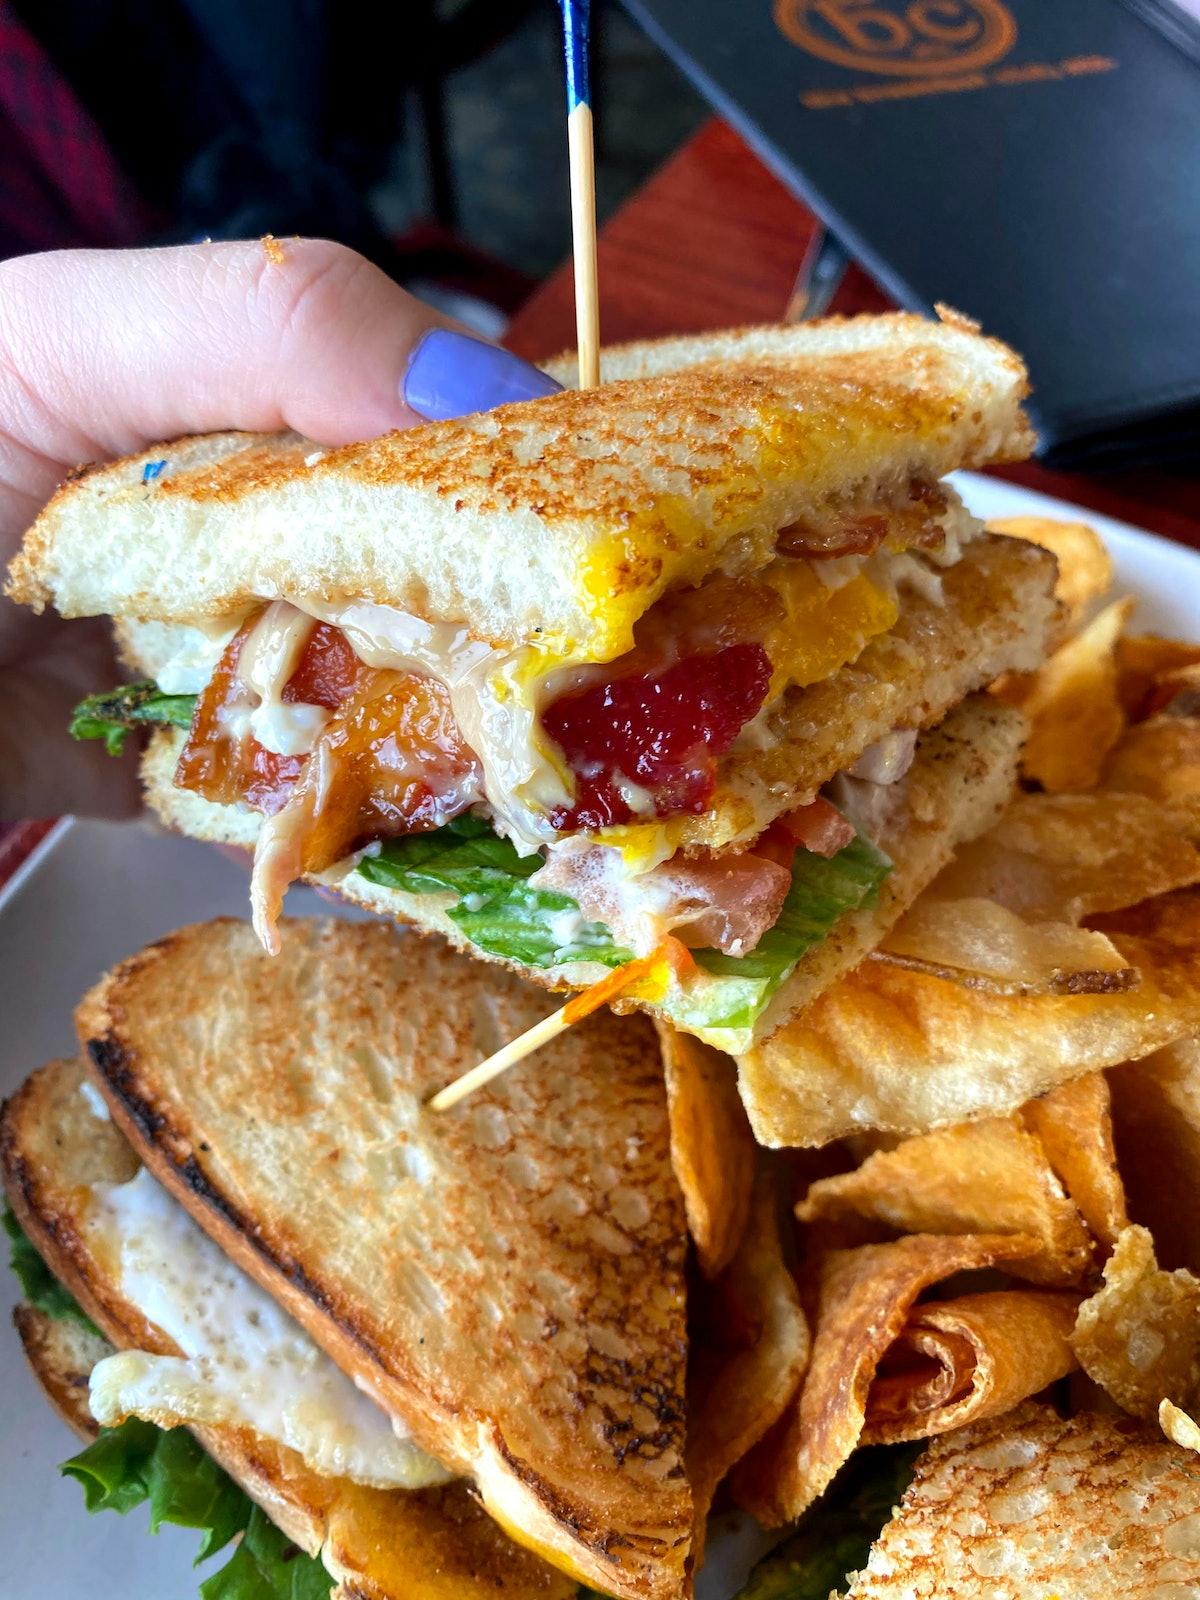 The Breakfast Club, Etc. Sandwich